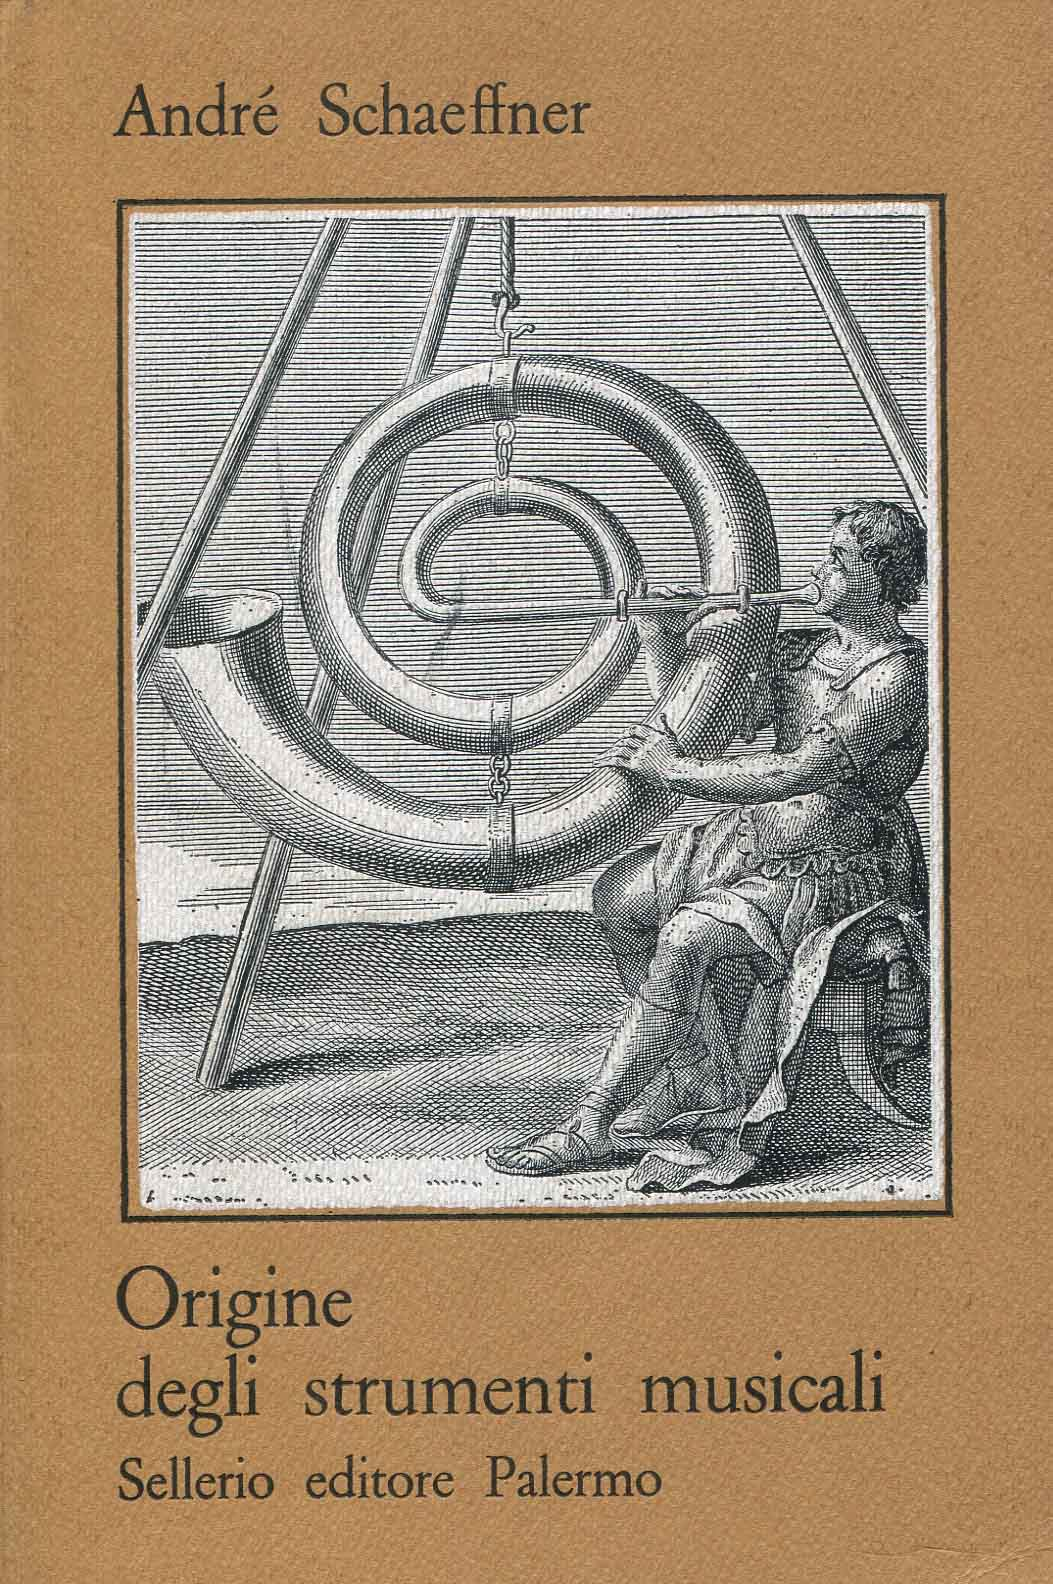 Origini degli strumenti musicali ; introduzione di Diego Carpitella